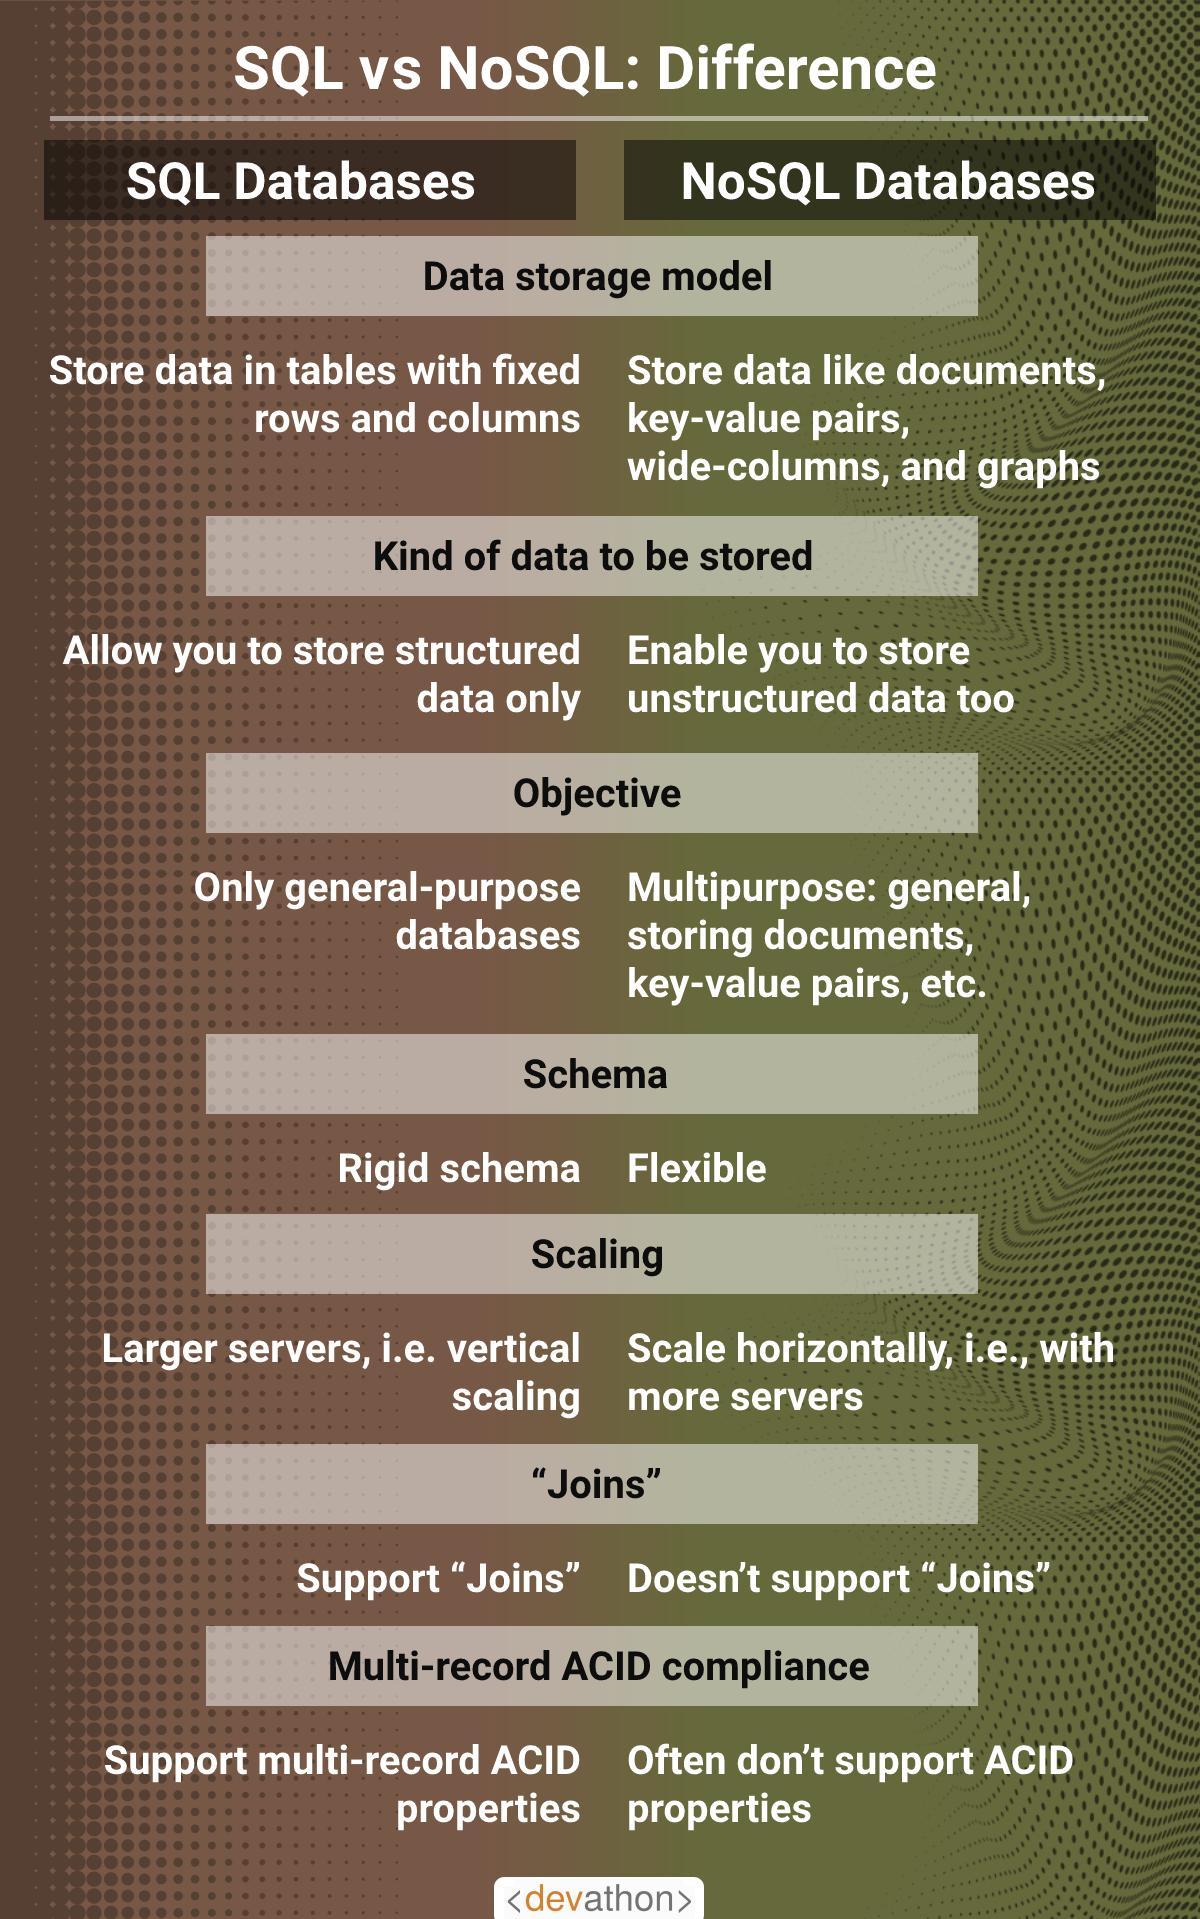 SQL-vs-NoSQL-difference